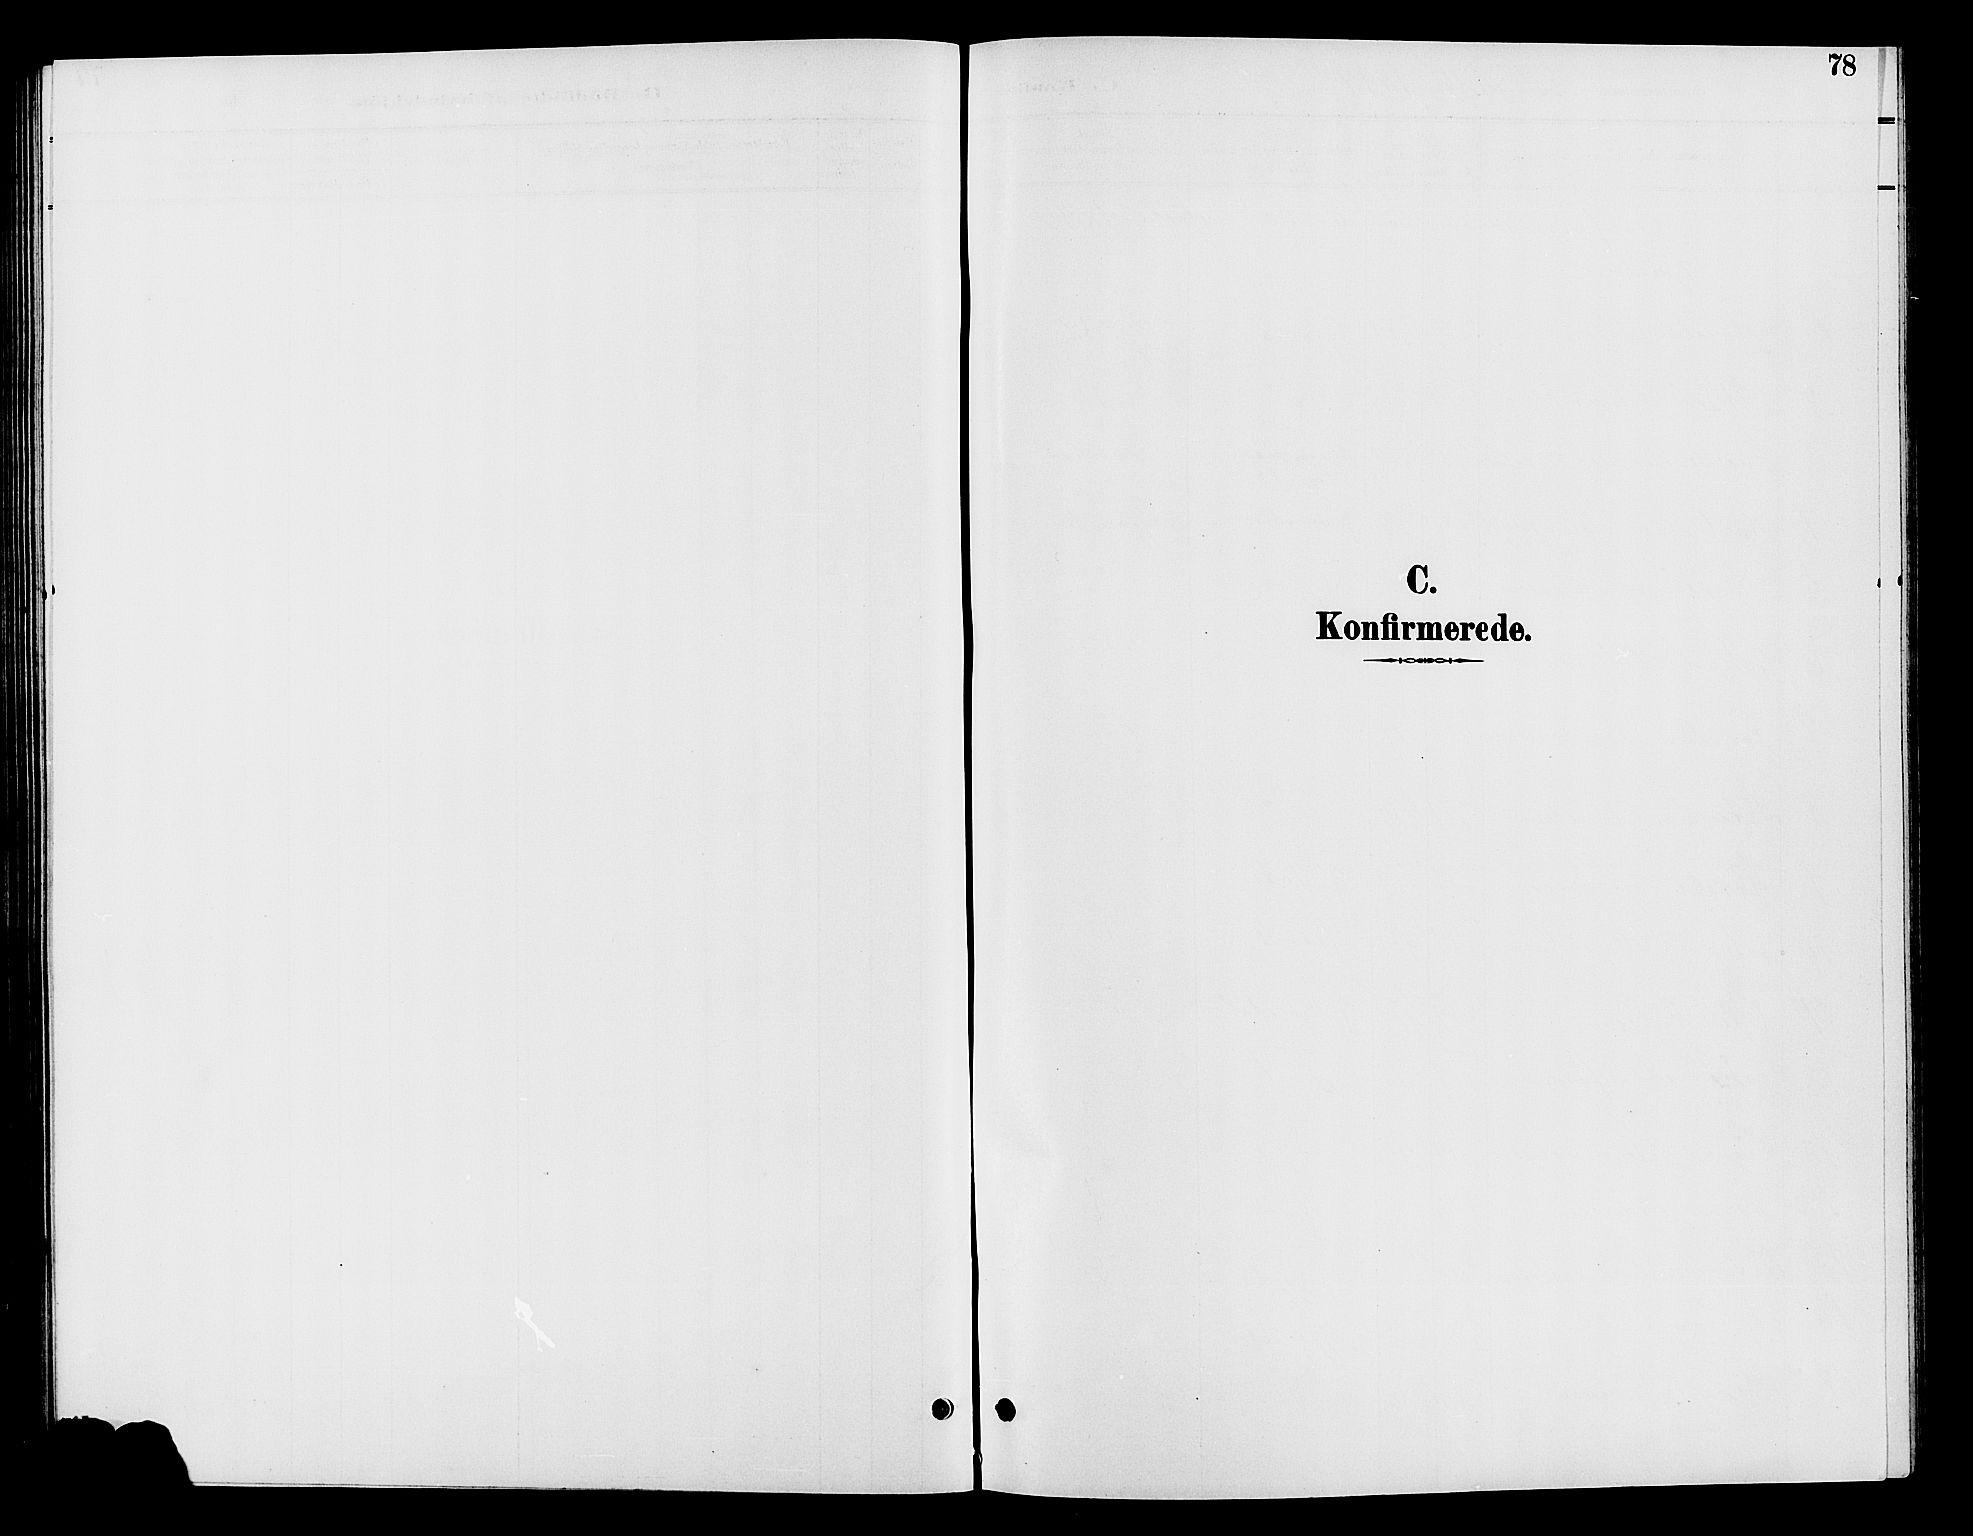 SAH, Vardal prestekontor, H/Ha/Hab/L0009: Klokkerbok nr. 9, 1894-1902, s. 78